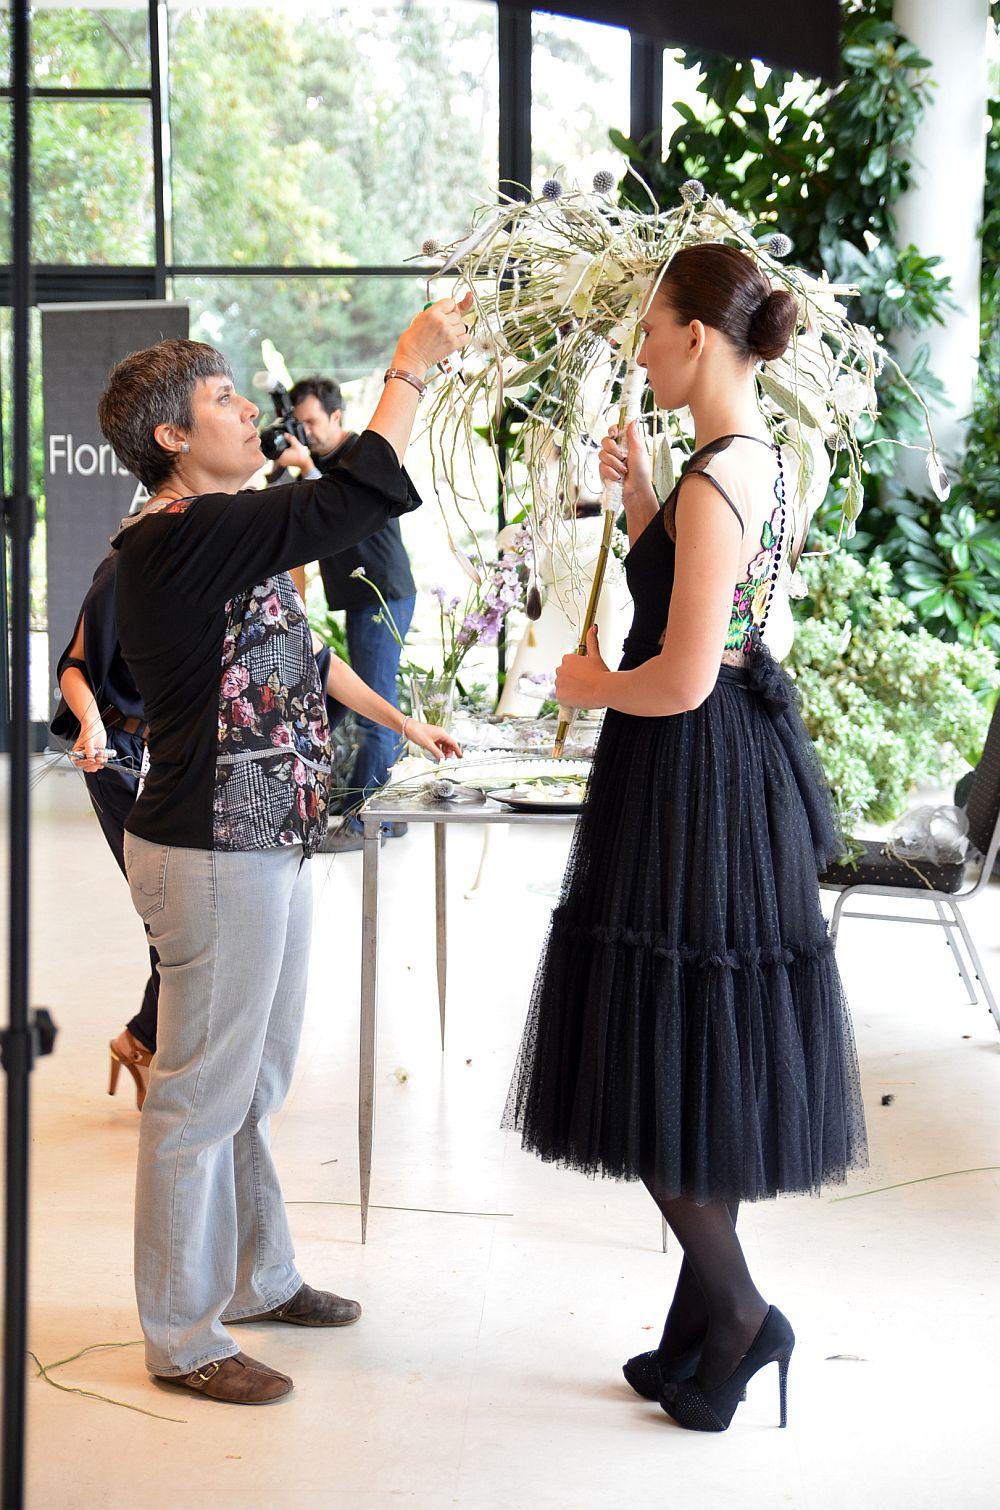 Designul Rosa Valls in cadrul show-ului Fashion&Flowers